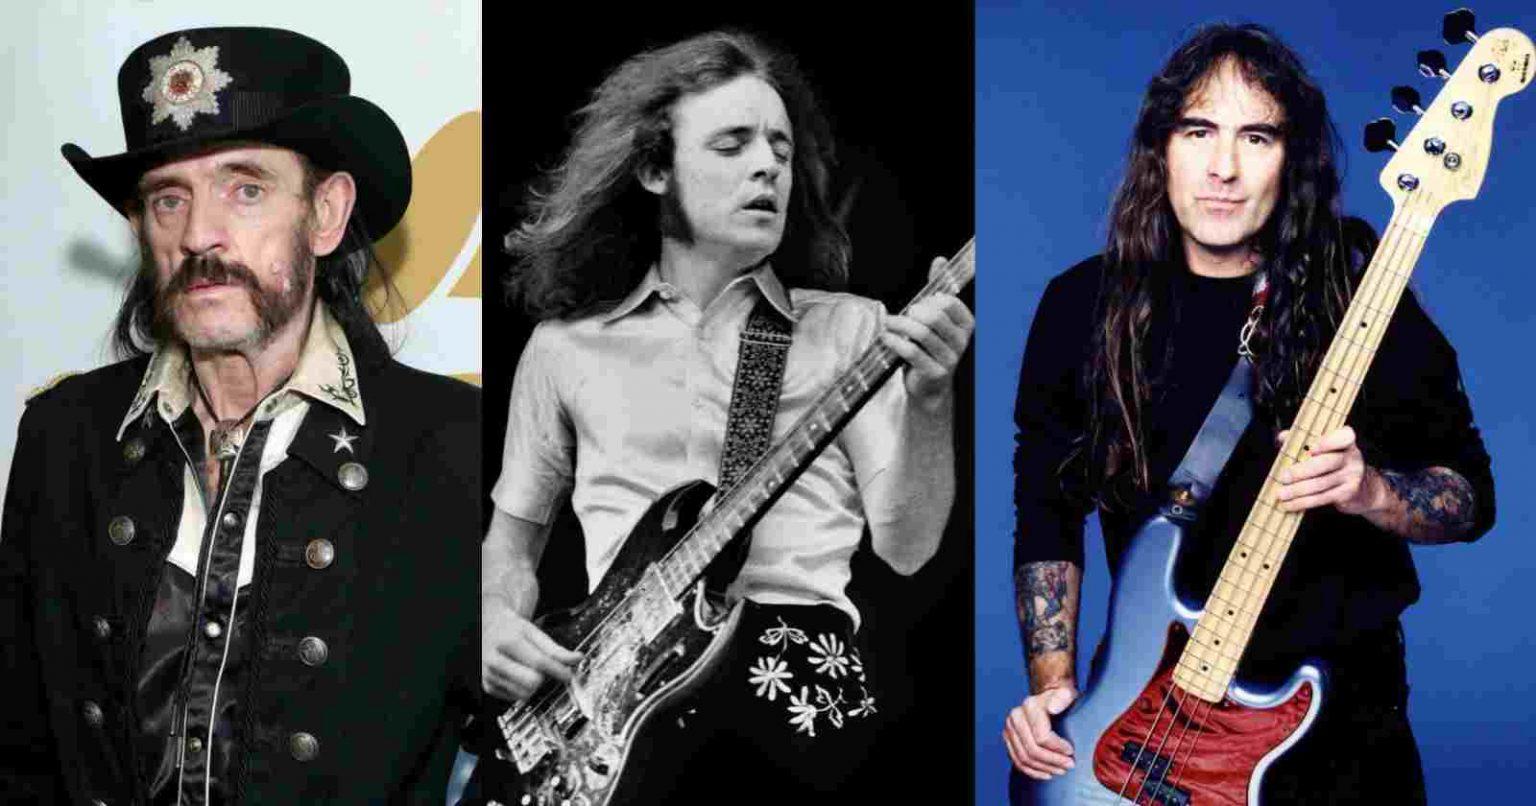 Lemmy-Kilmister-Jack-Bruce